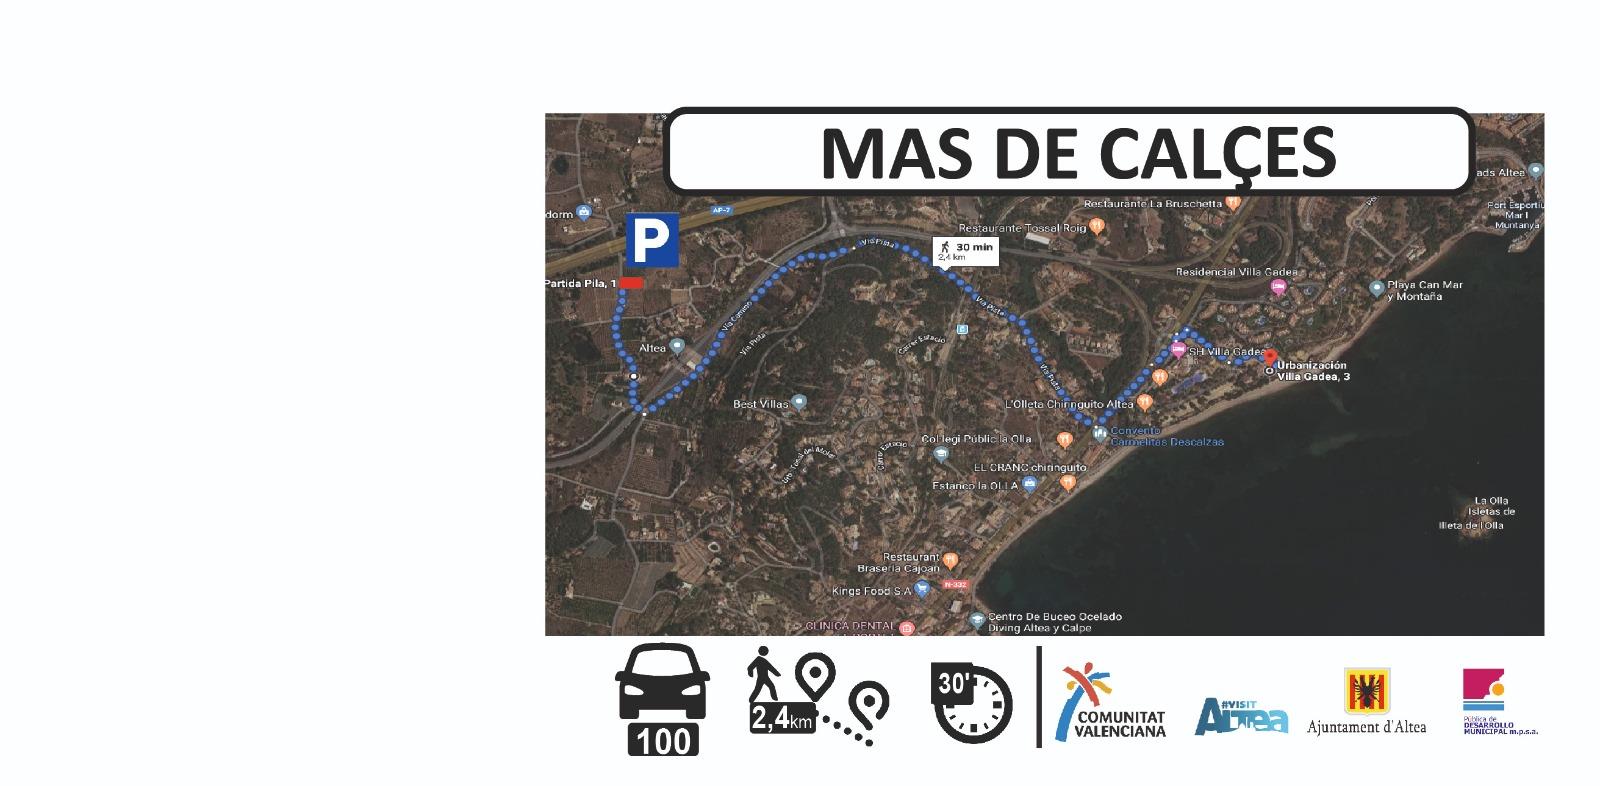 Parking castell de l'olla